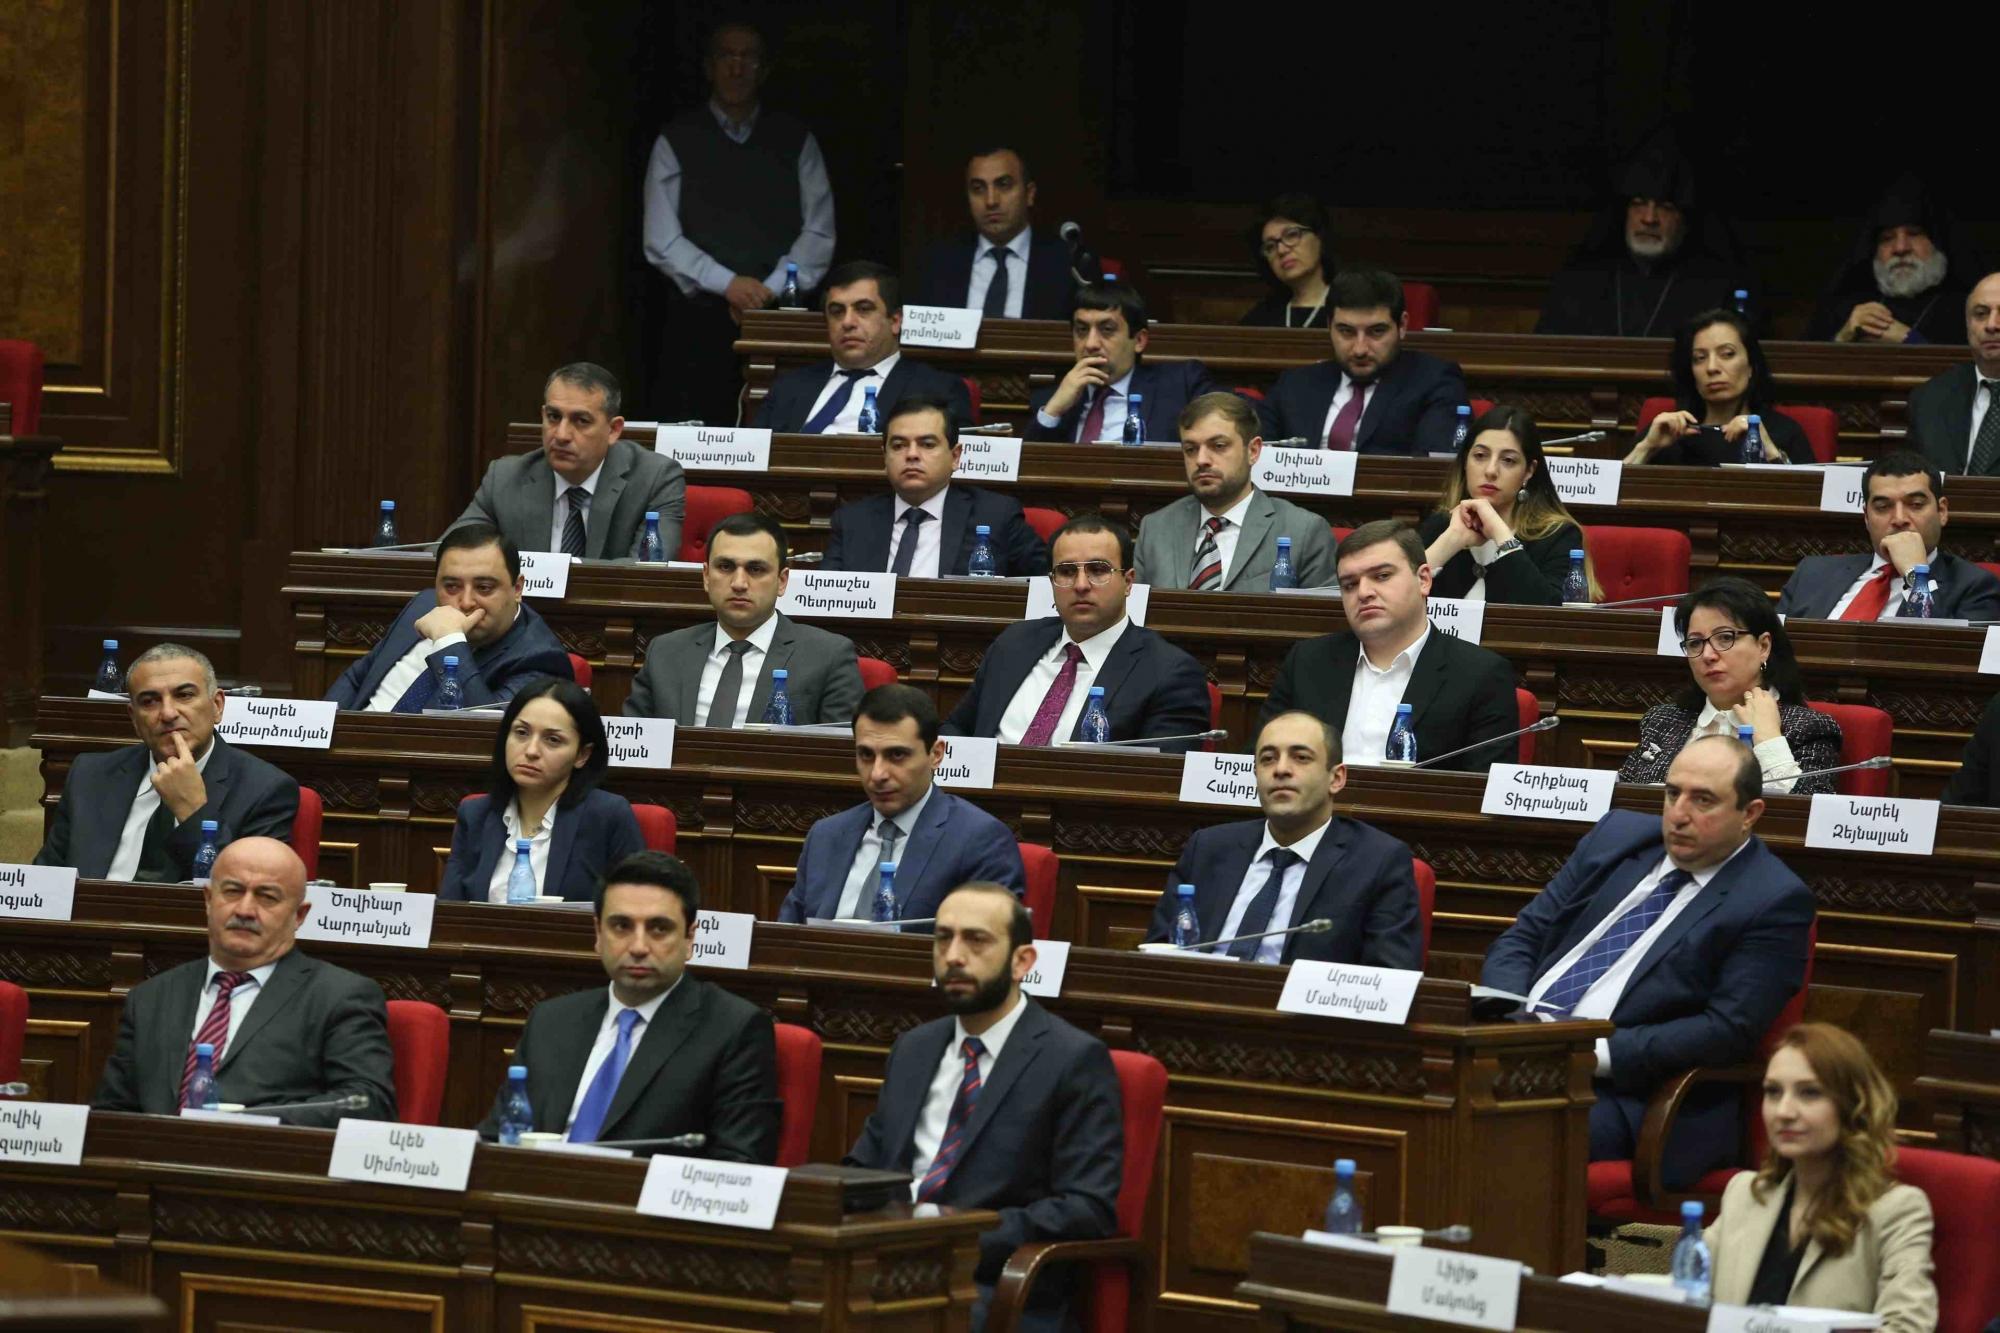 Photo of «ԱԺ իշխող խմբակցությունն անկարող է հրապարակային քննադատելու իր իսկ ձևավորած կառավարության աշխատանքը»